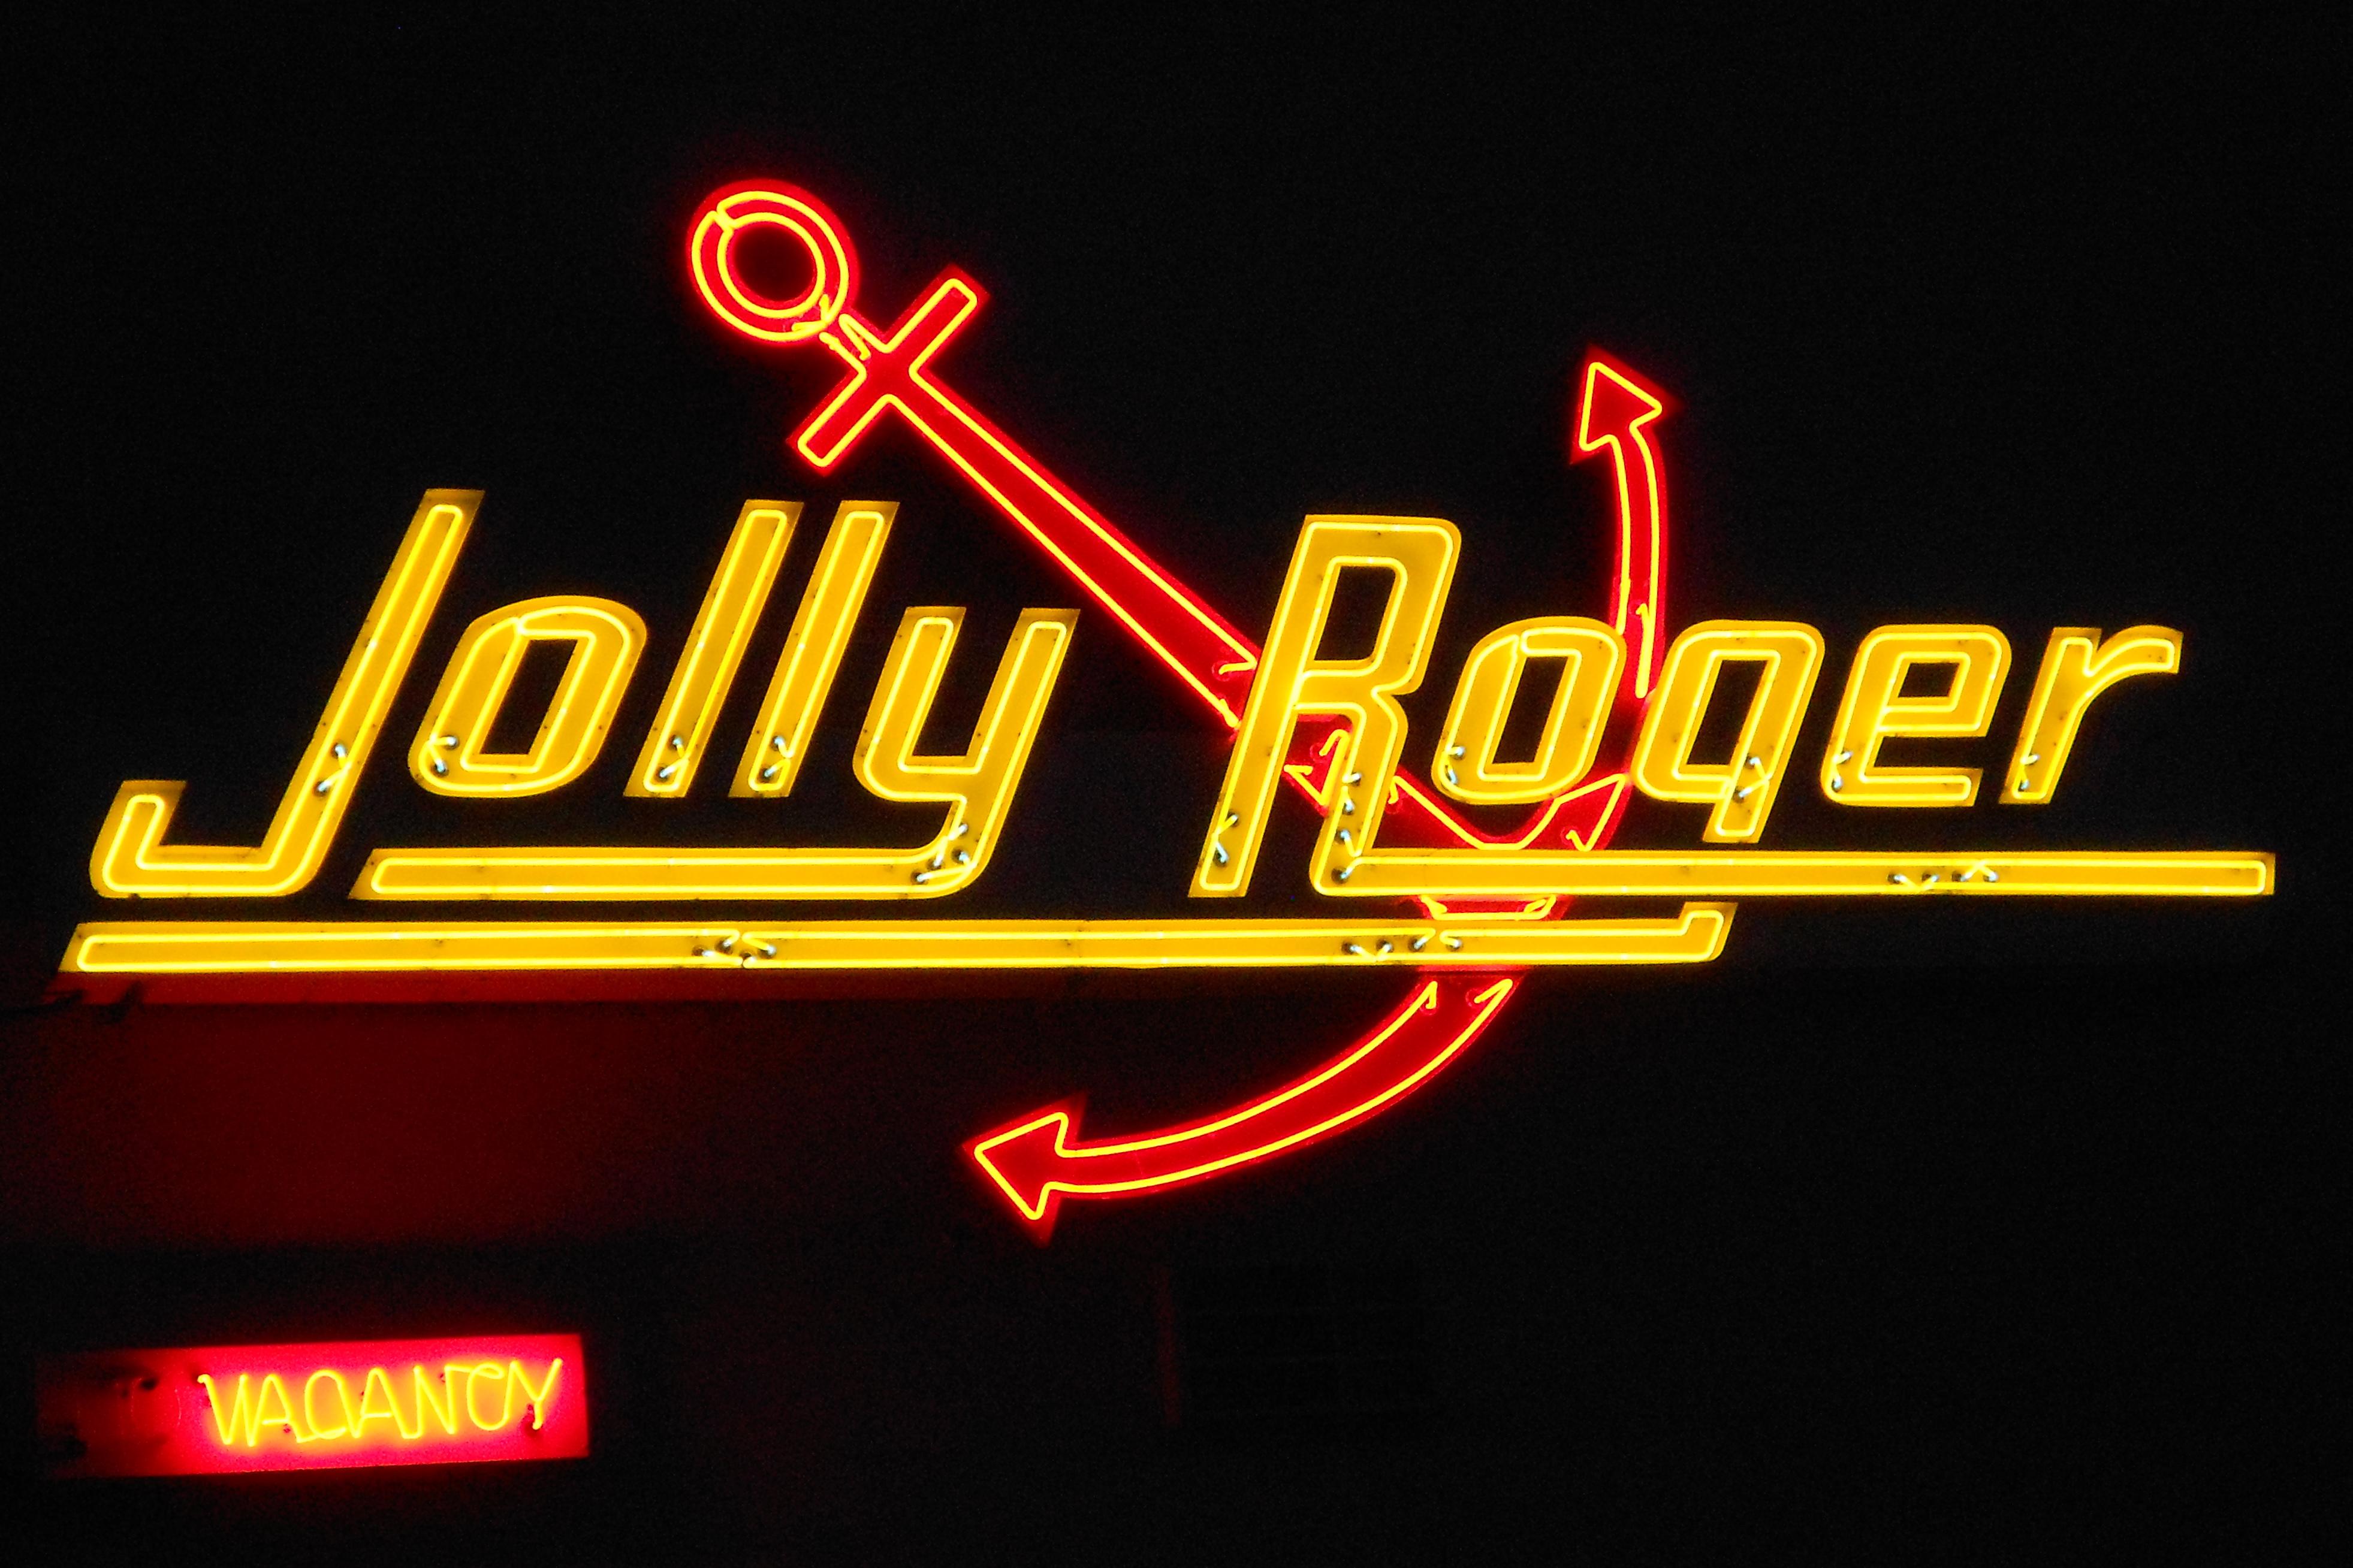 Jolly Roger Motel Topsail Beach Nc